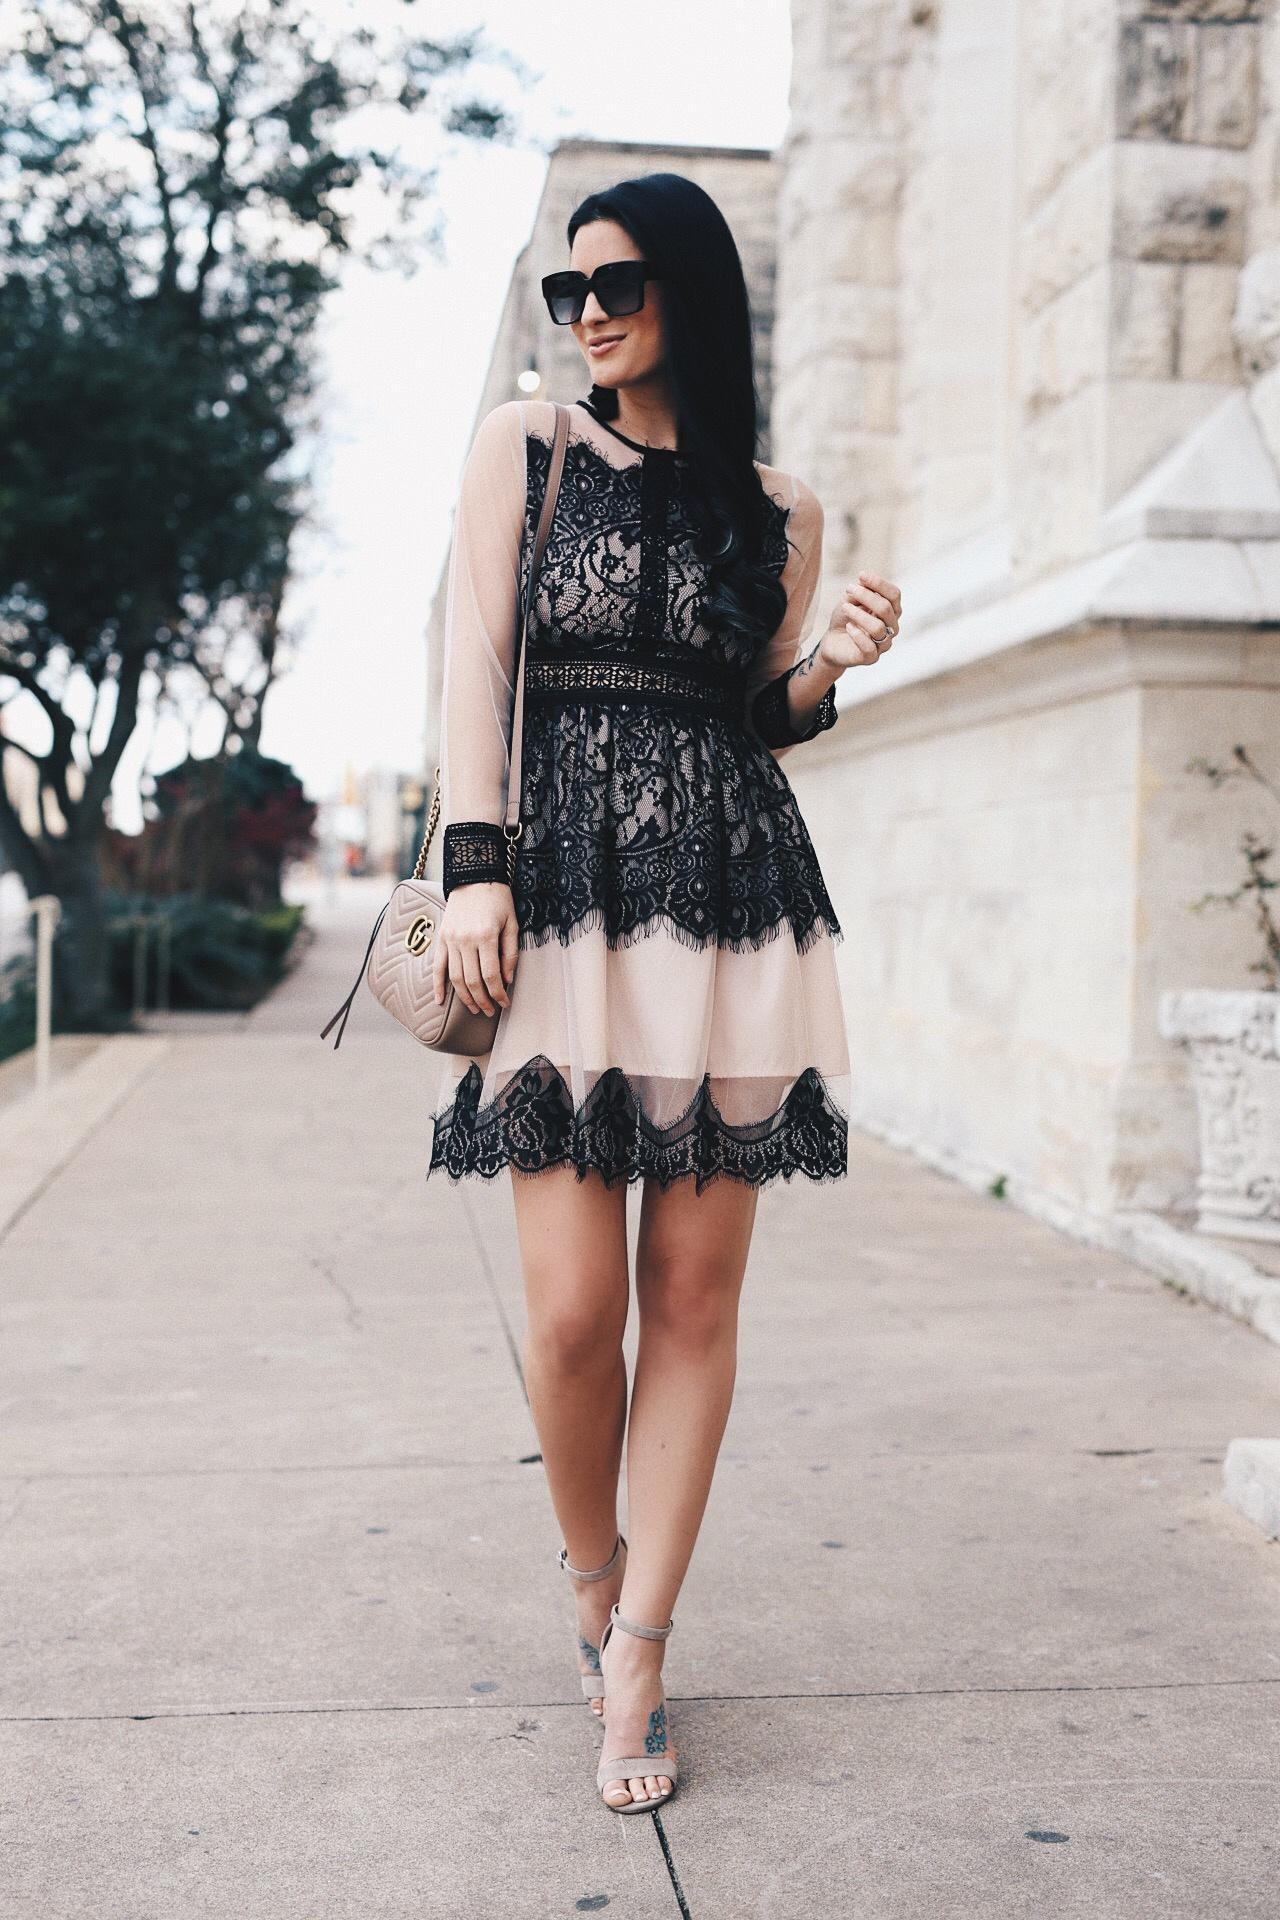 Womens Black Lace Dress Fashion Style Dressed To Kill